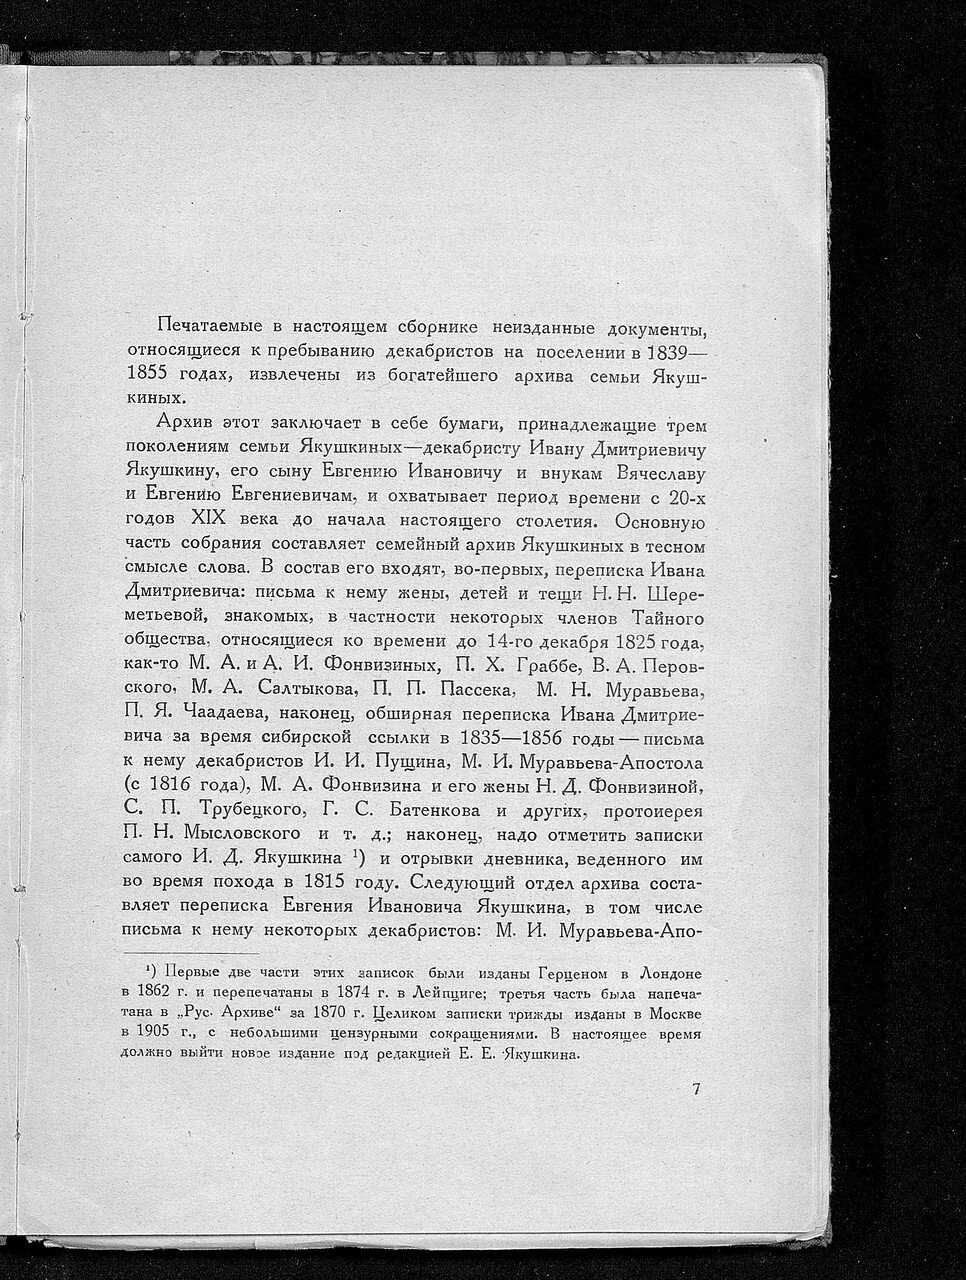 https://img-fotki.yandex.ru/get/483127/199368979.a0/0_214305_f0e0726c_XXXL.jpg